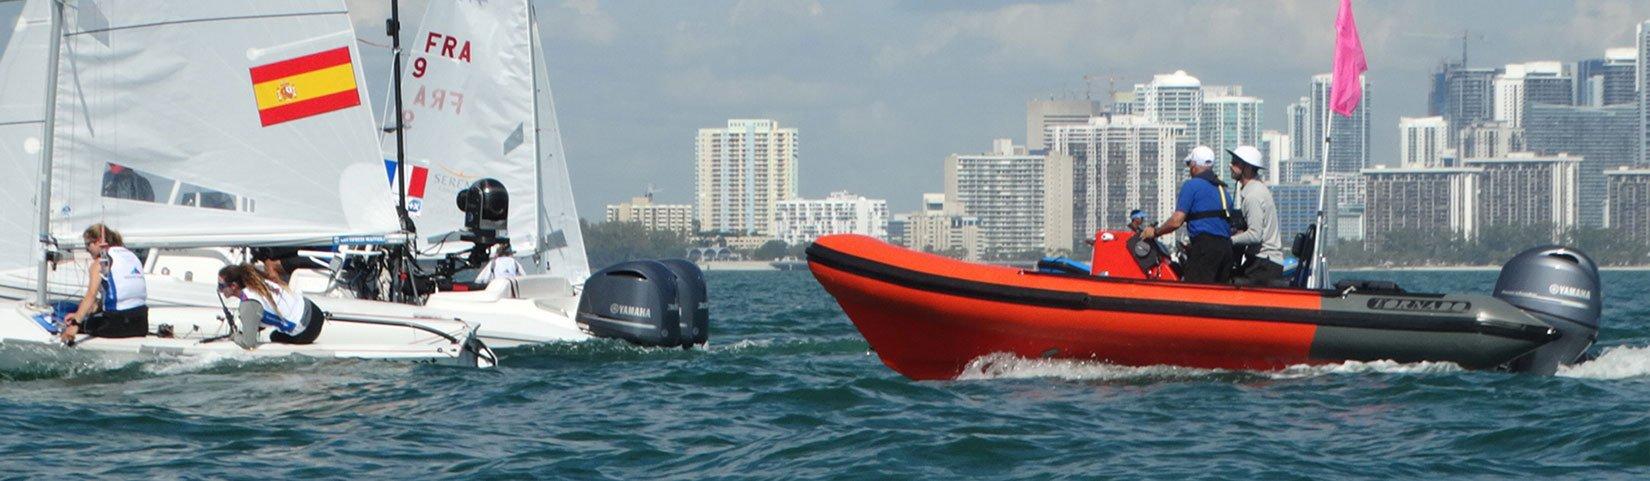 charter-coach-boats-usa